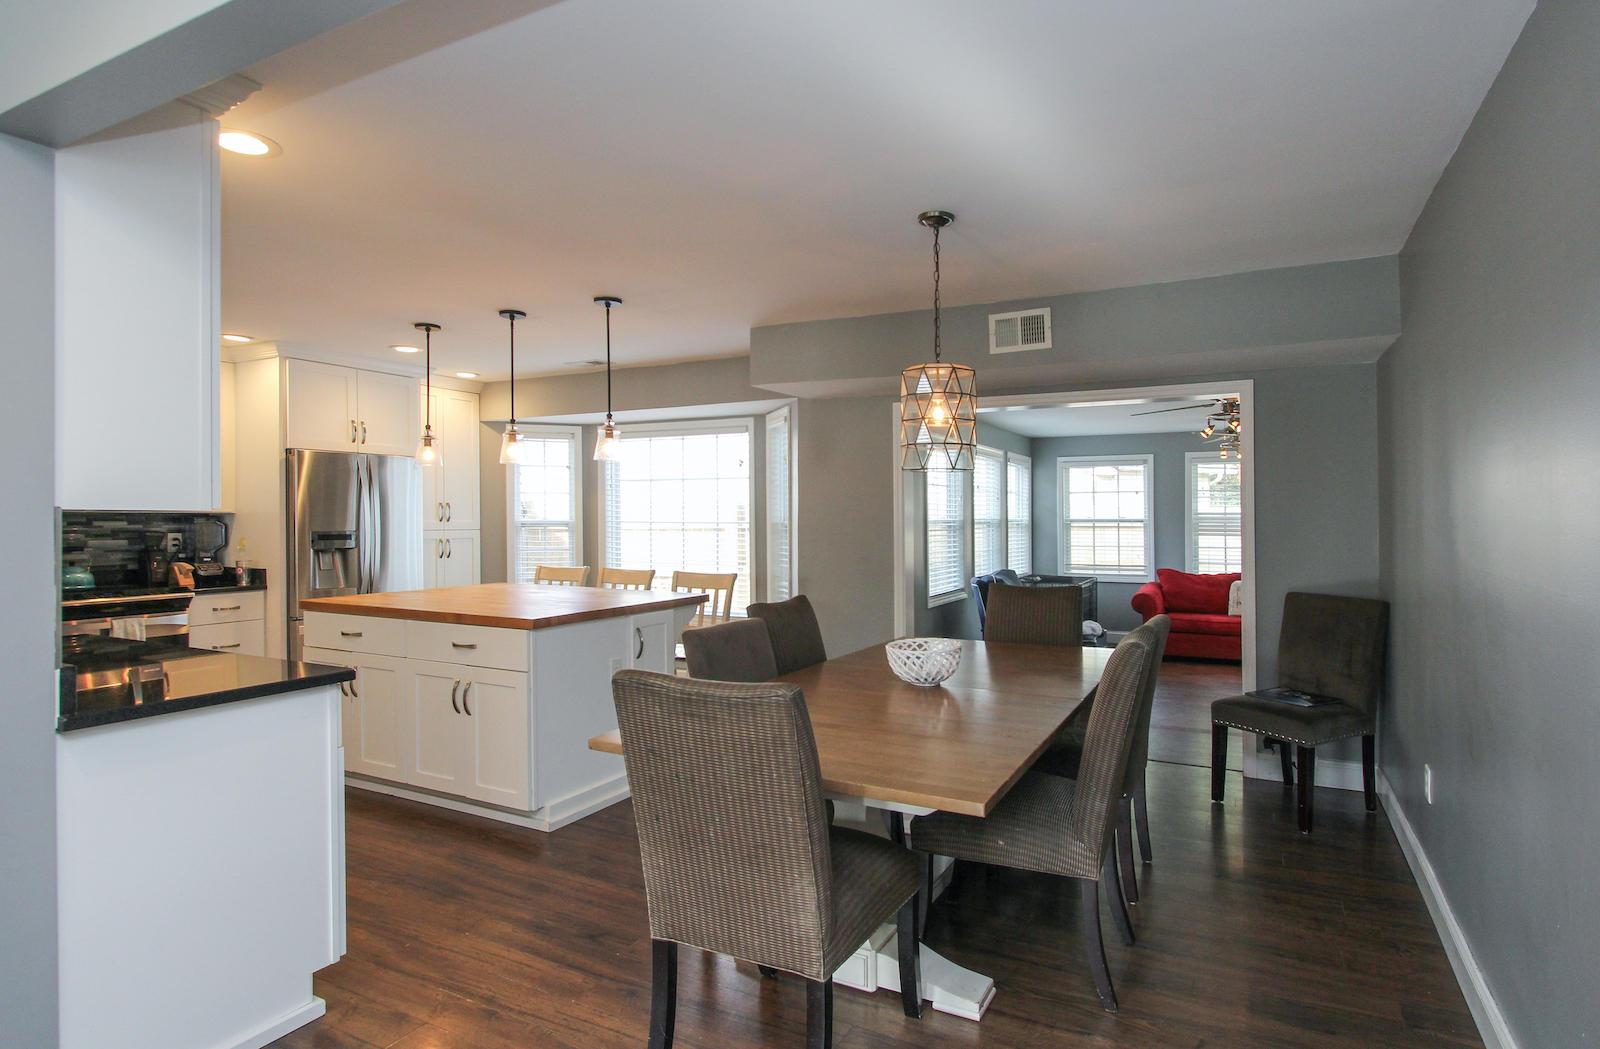 Landings Run Homes For Sale - 1548 Wickfield, Mount Pleasant, SC - 16